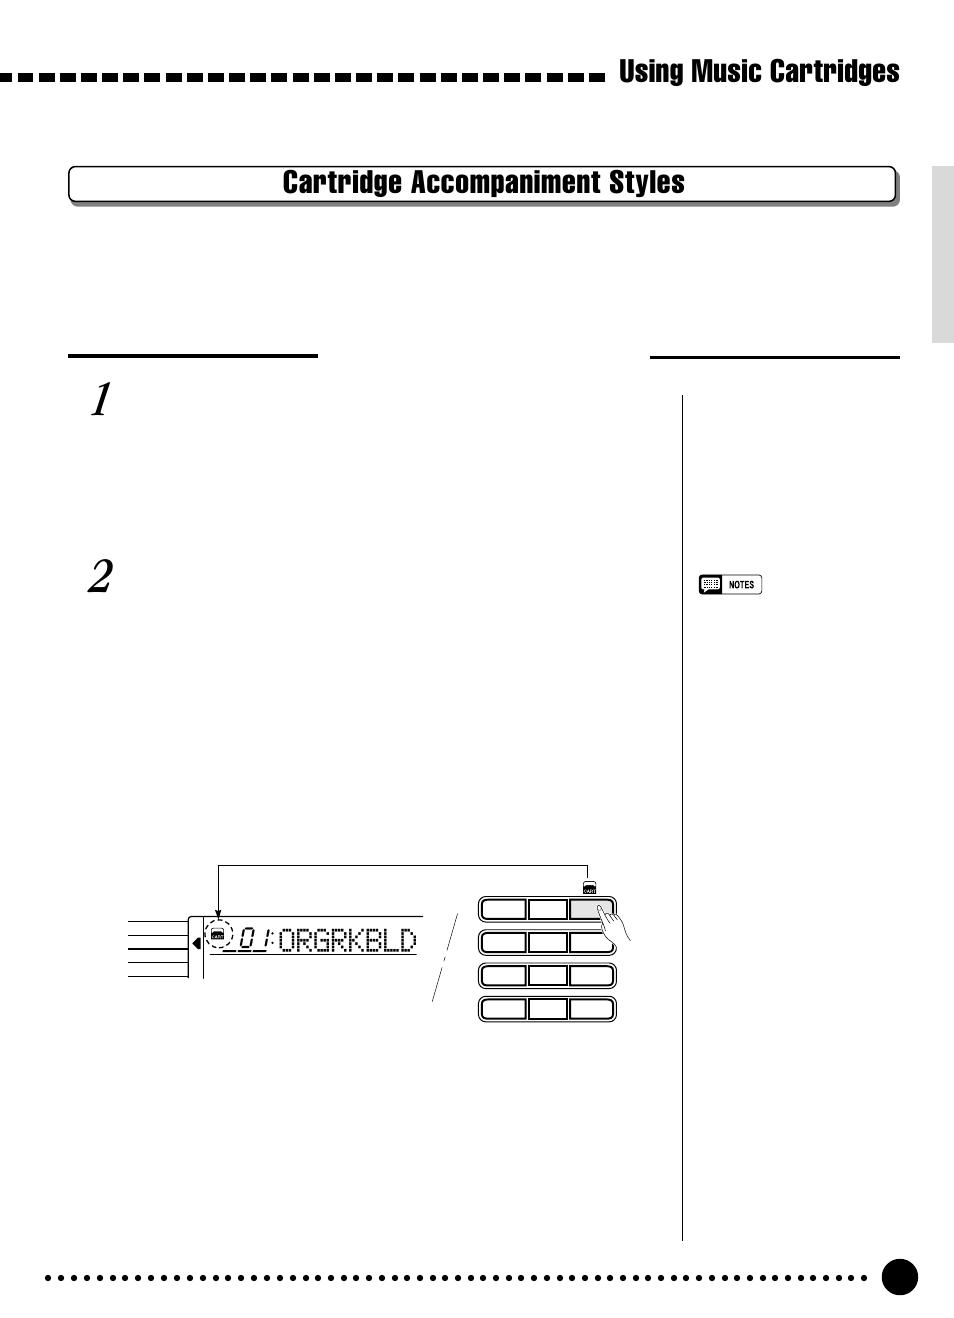 Using music cartridges, Cartridge accompaniment styles